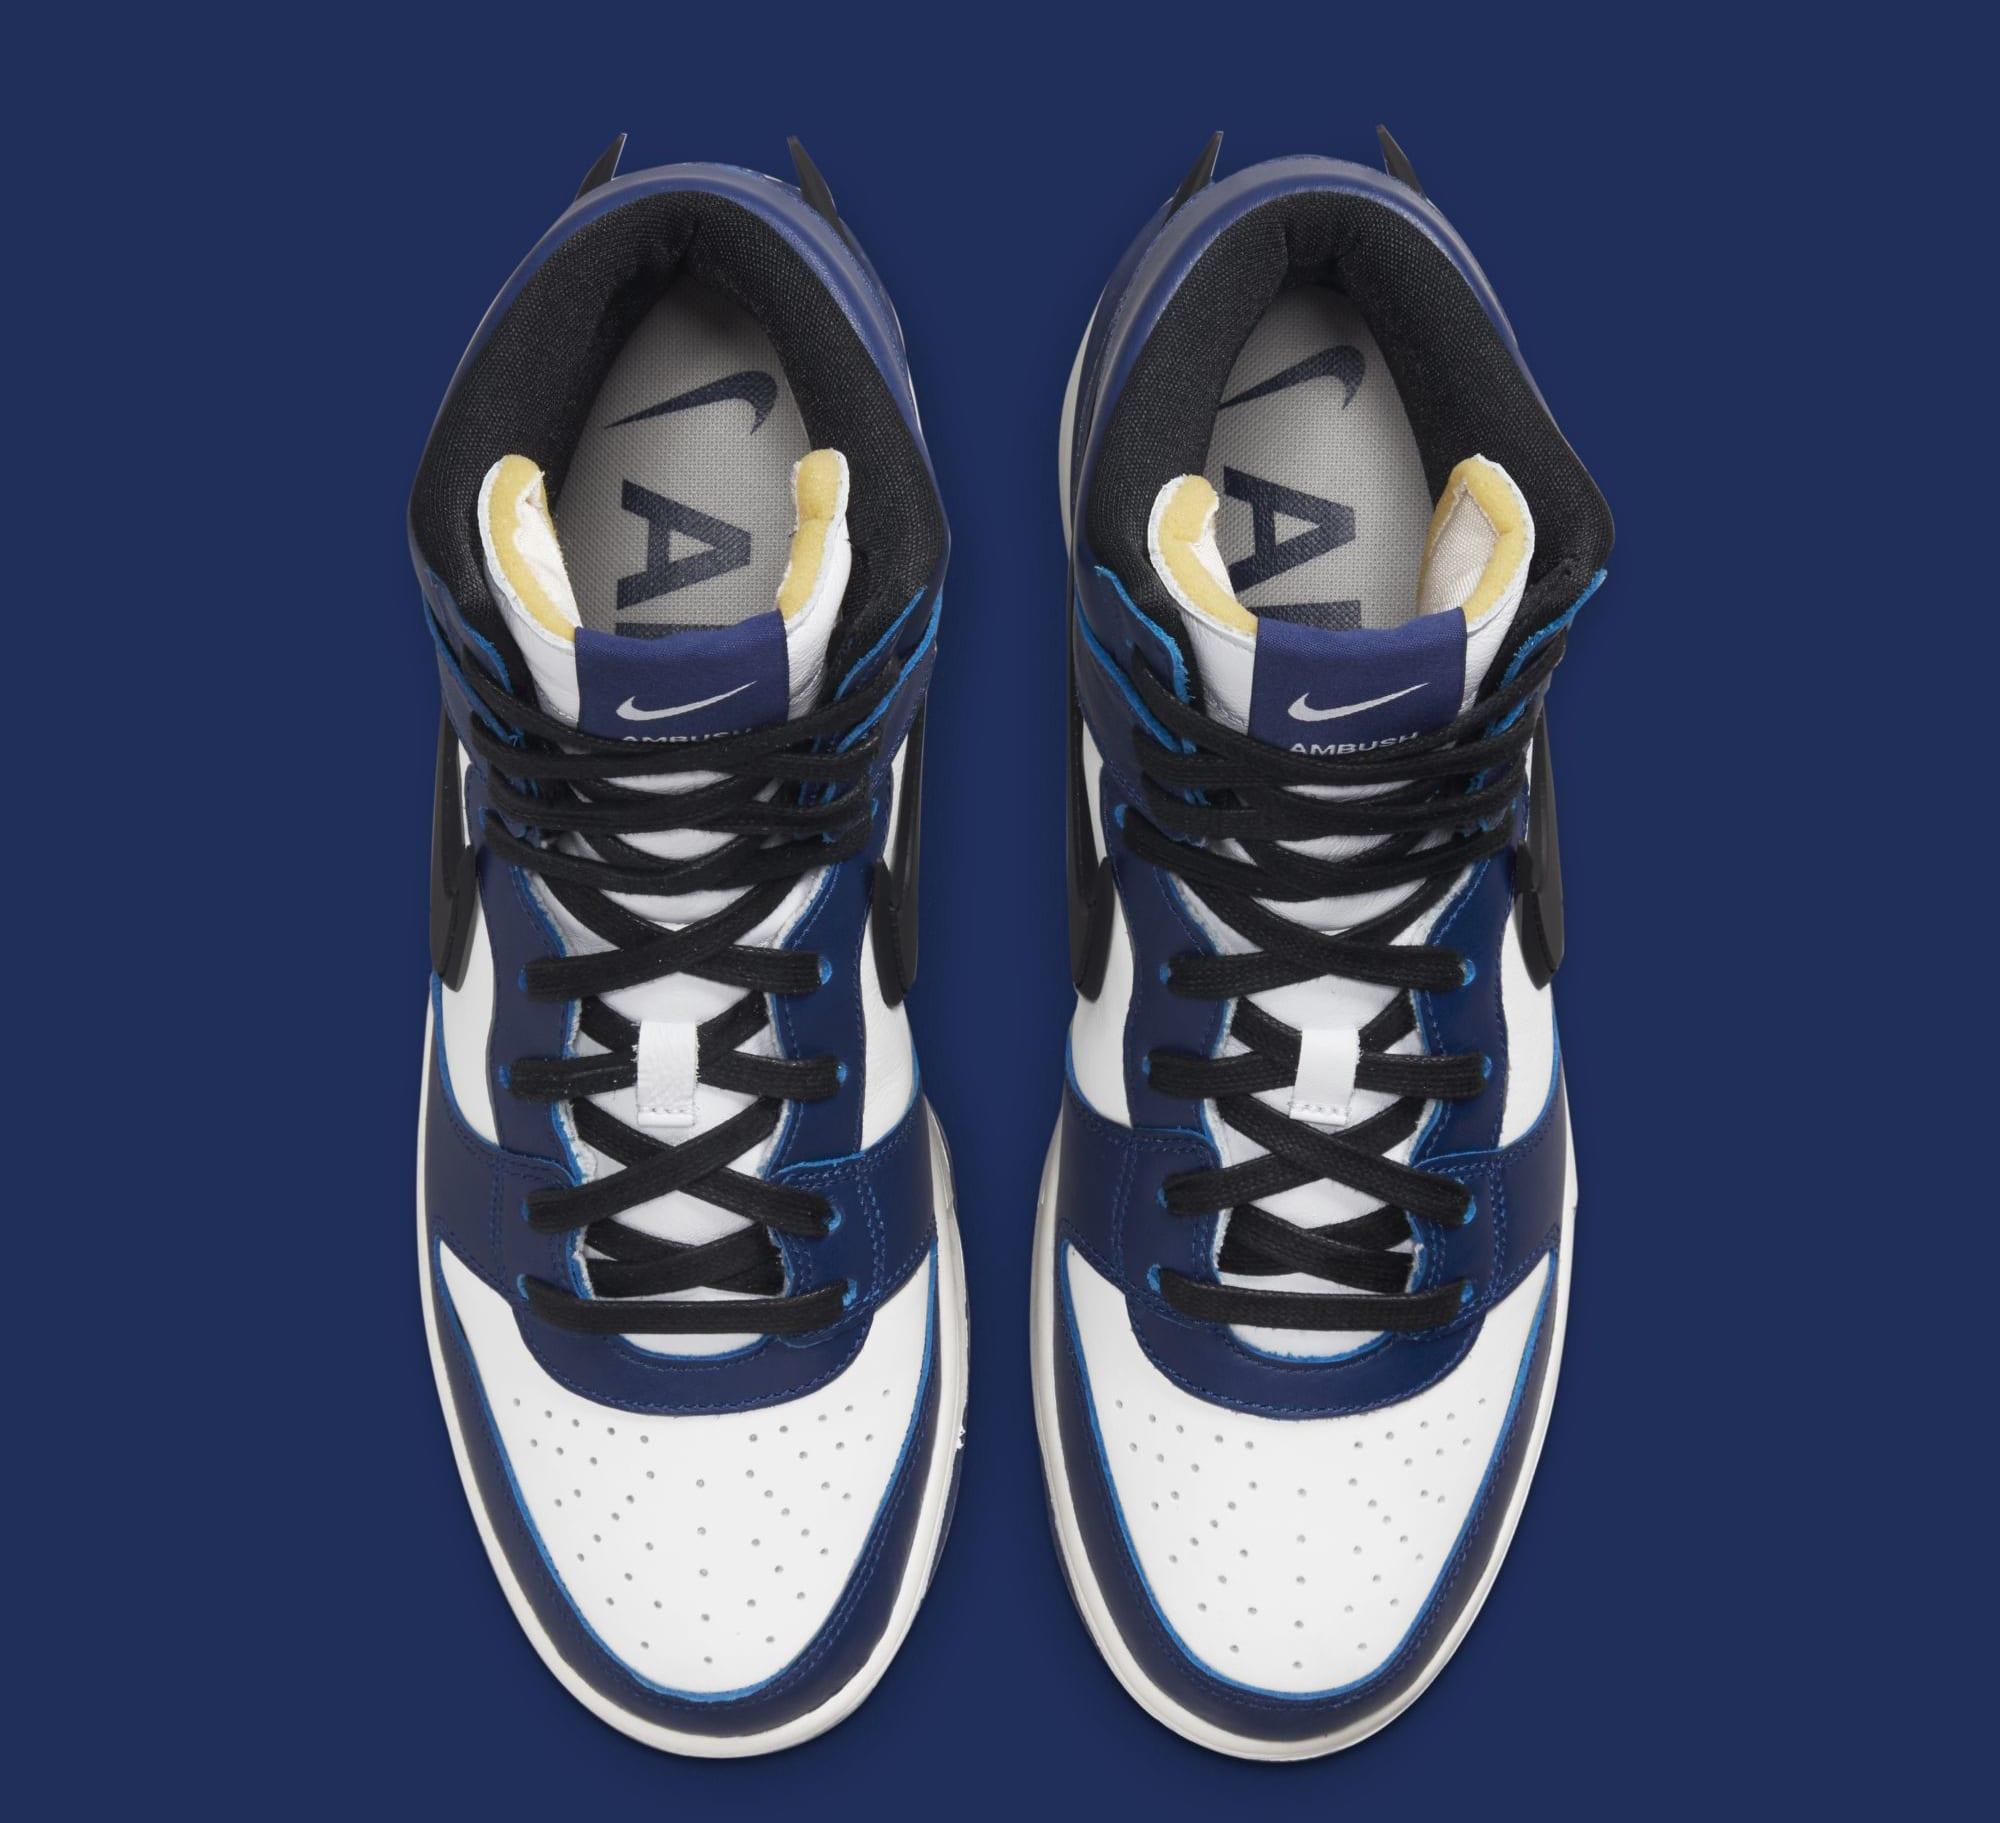 Ambush x Nike Dunk High 'Deep Royal Blue' CU7544-400 (Top)